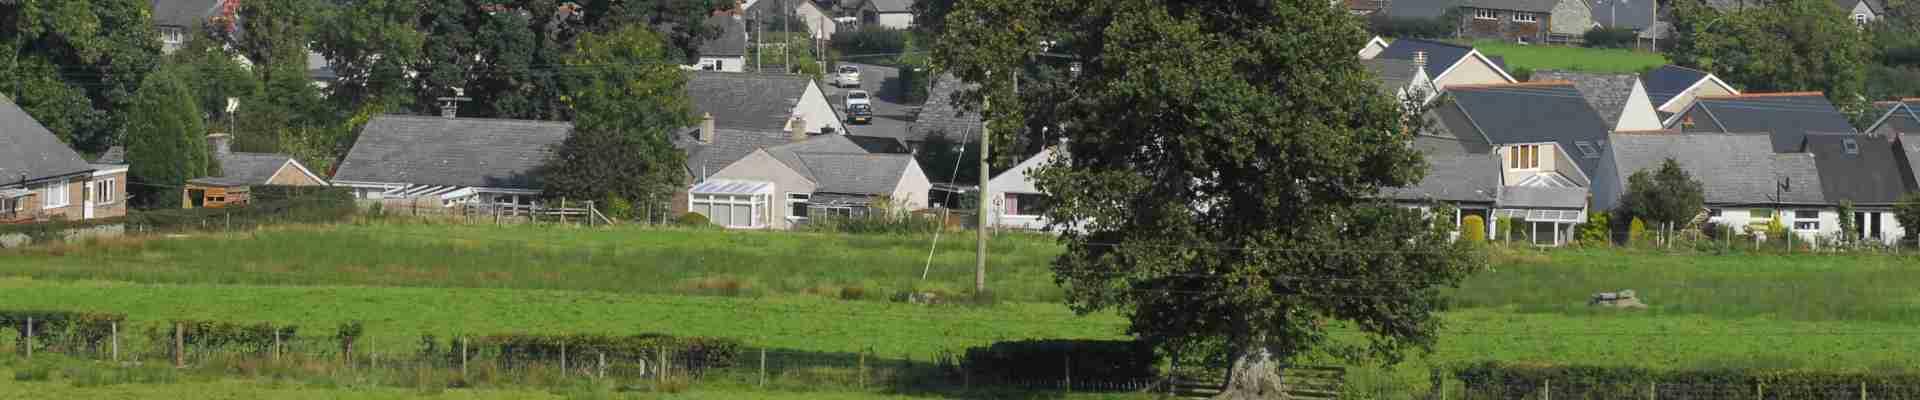 Llandrillo Holiday Cottages